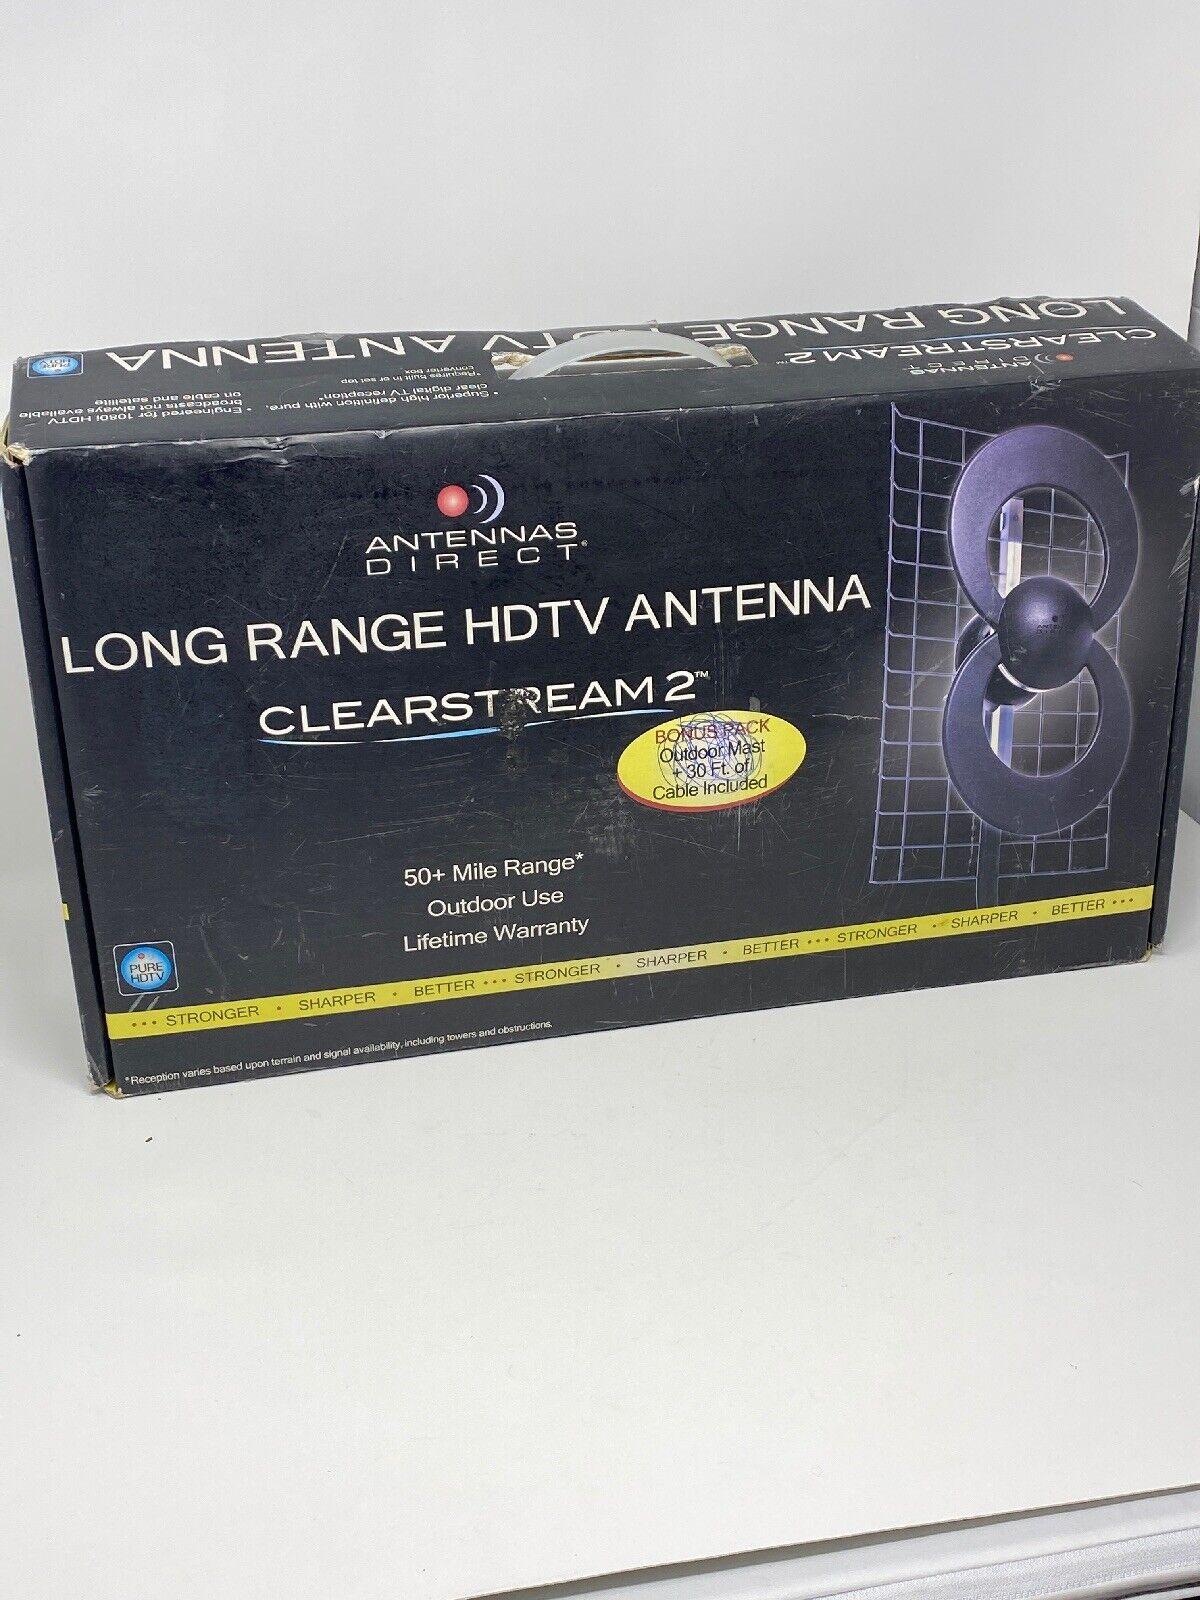 C2-CJM-30 circle_7_resale ANTENNAS DIRECT CLEARSTREAM 2 INDOOR/OUTDOOR UHF HDTV ANTENNA C2-CJM 50+ MILES